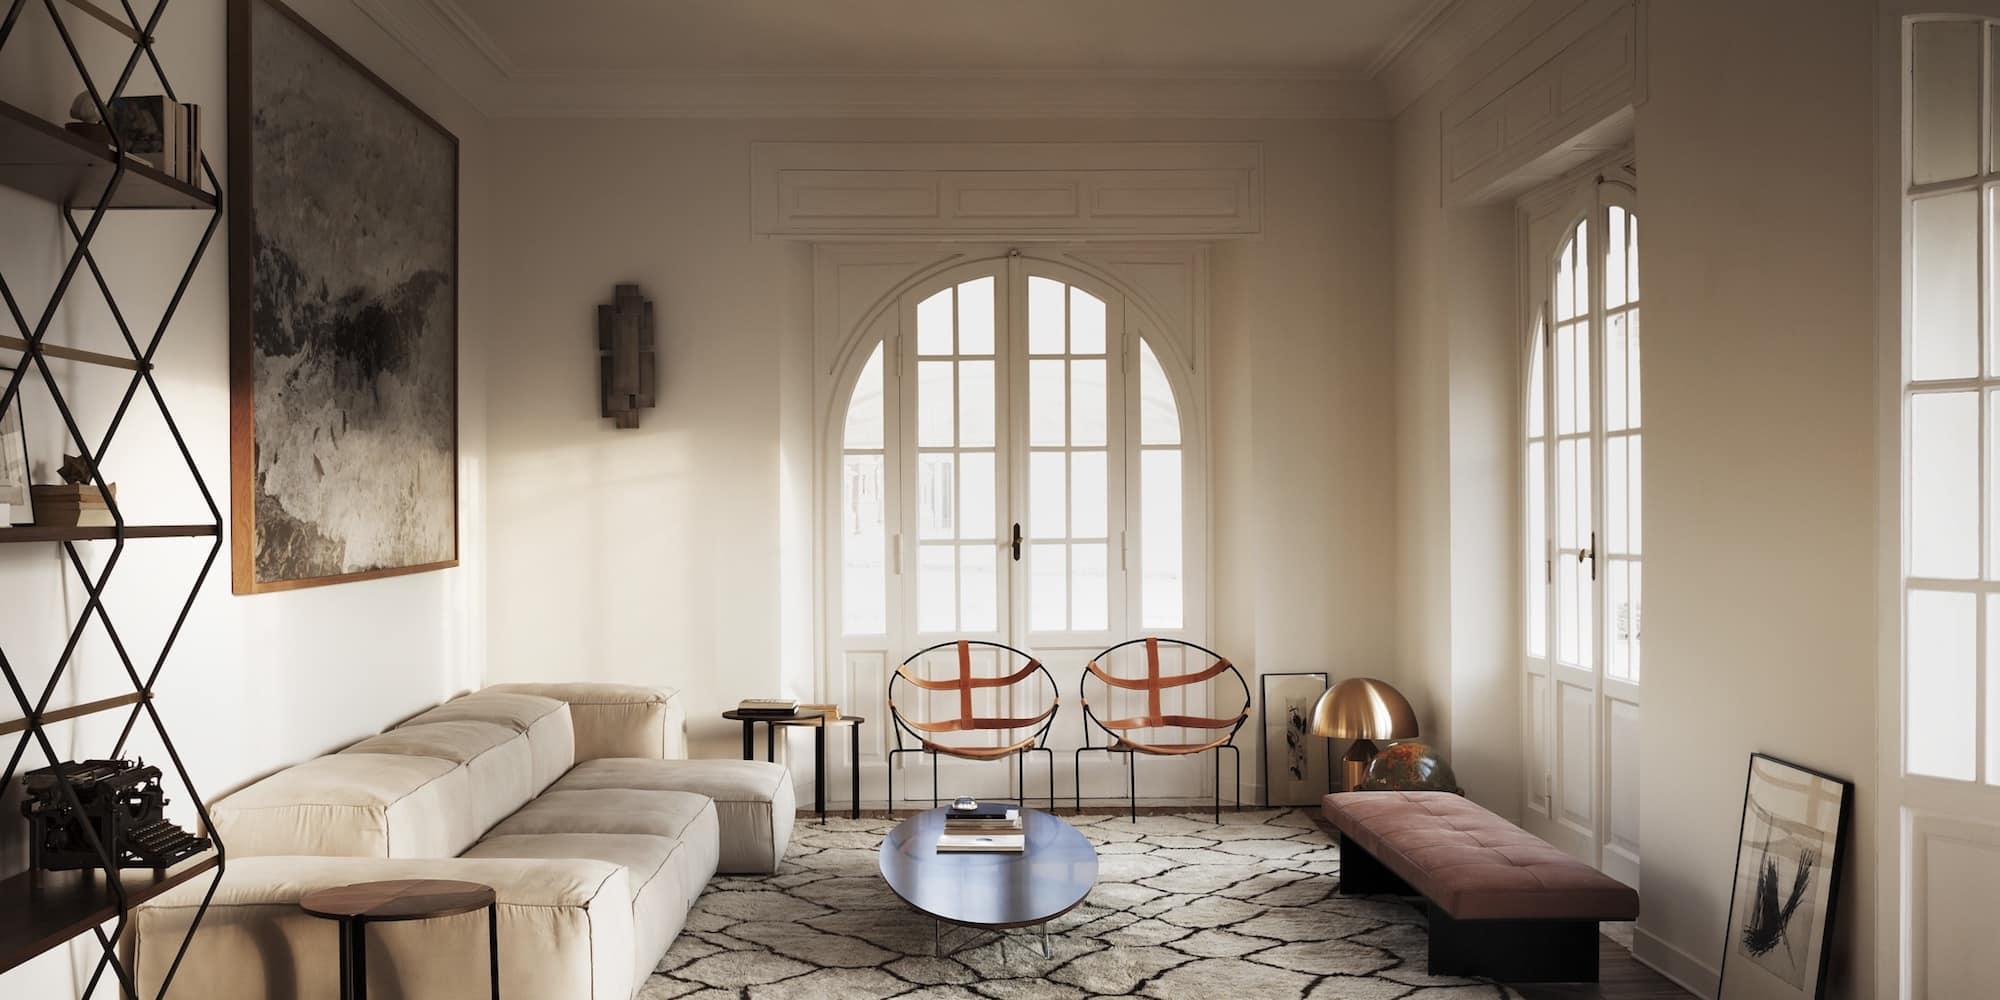 24 Majestic Italian Interiors The Study